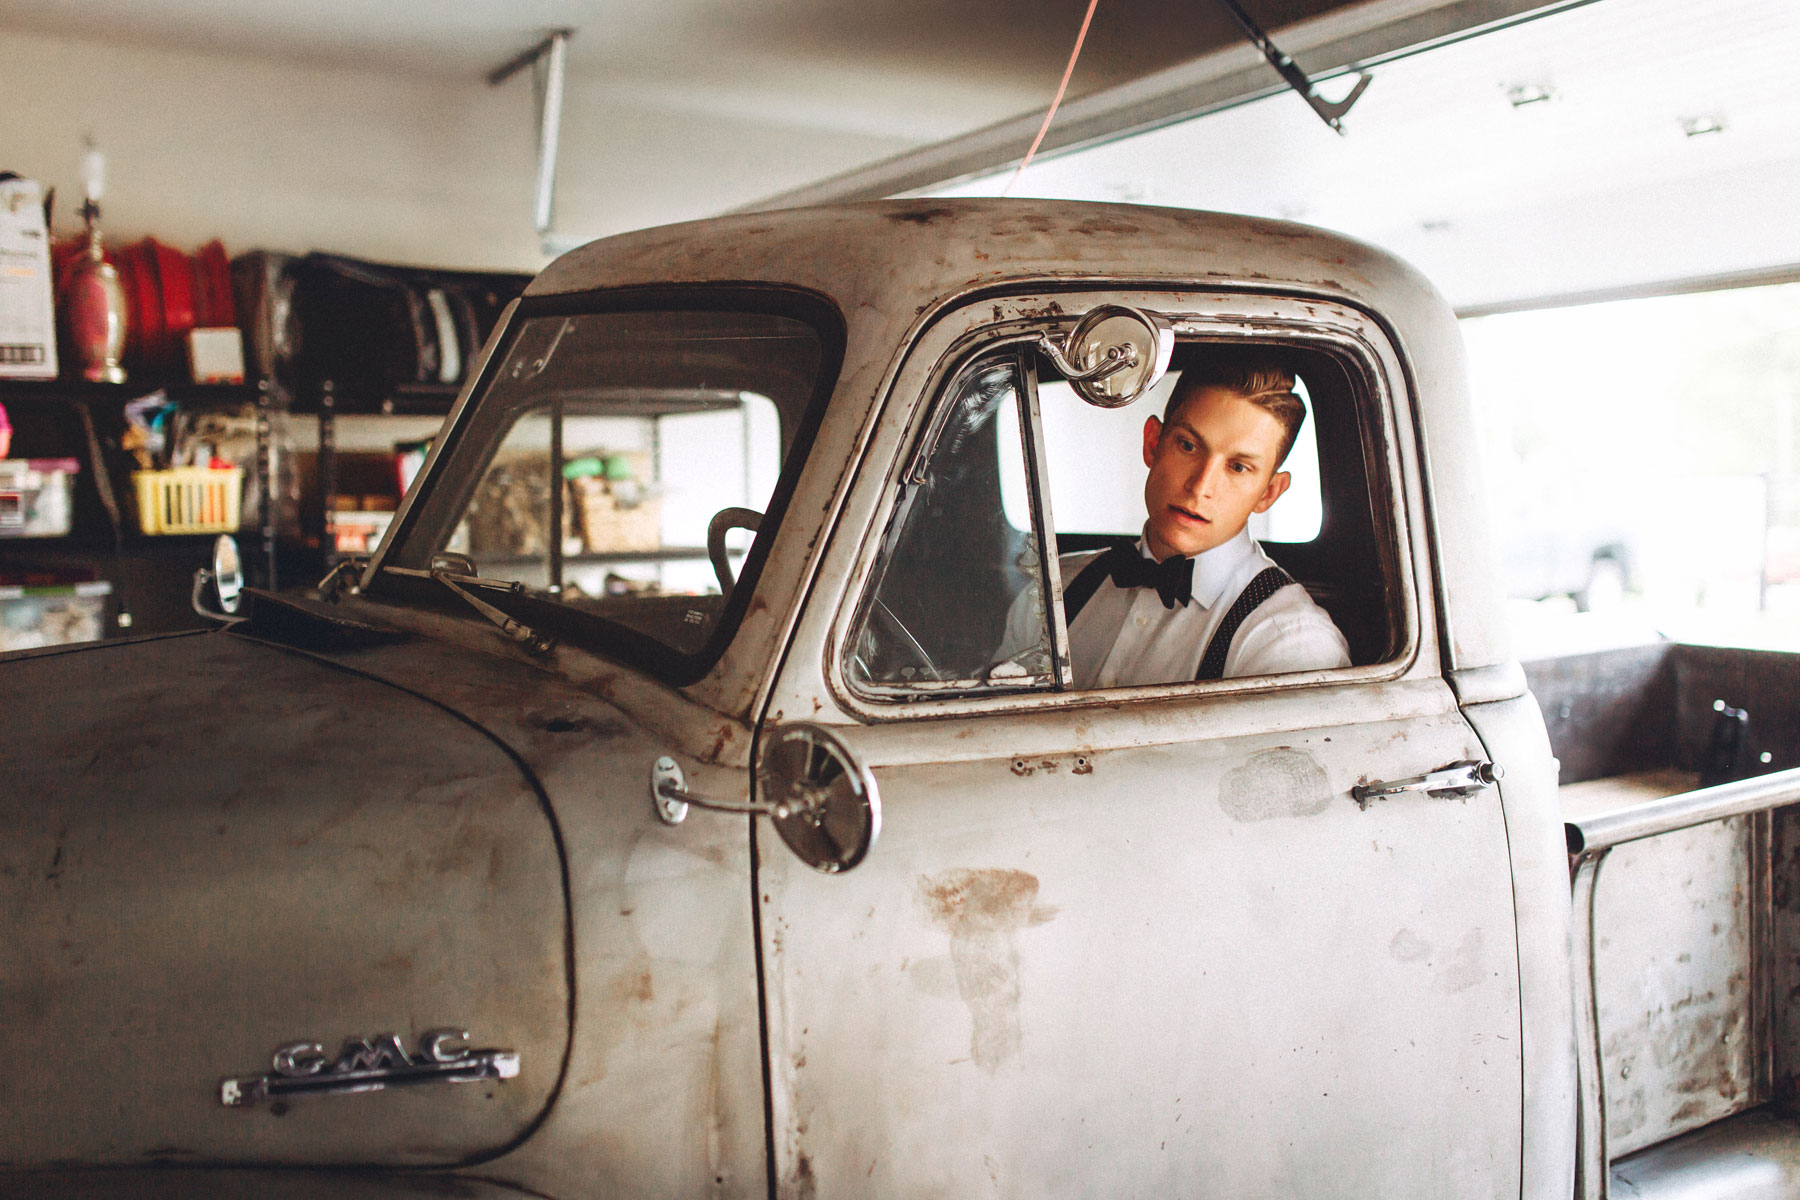 Me & Mr. Jones Wedding, Nashville Wedding, Bourbon Bar, Kentucky Wedding, Groomsmen Getting Ready, Vintage Truck